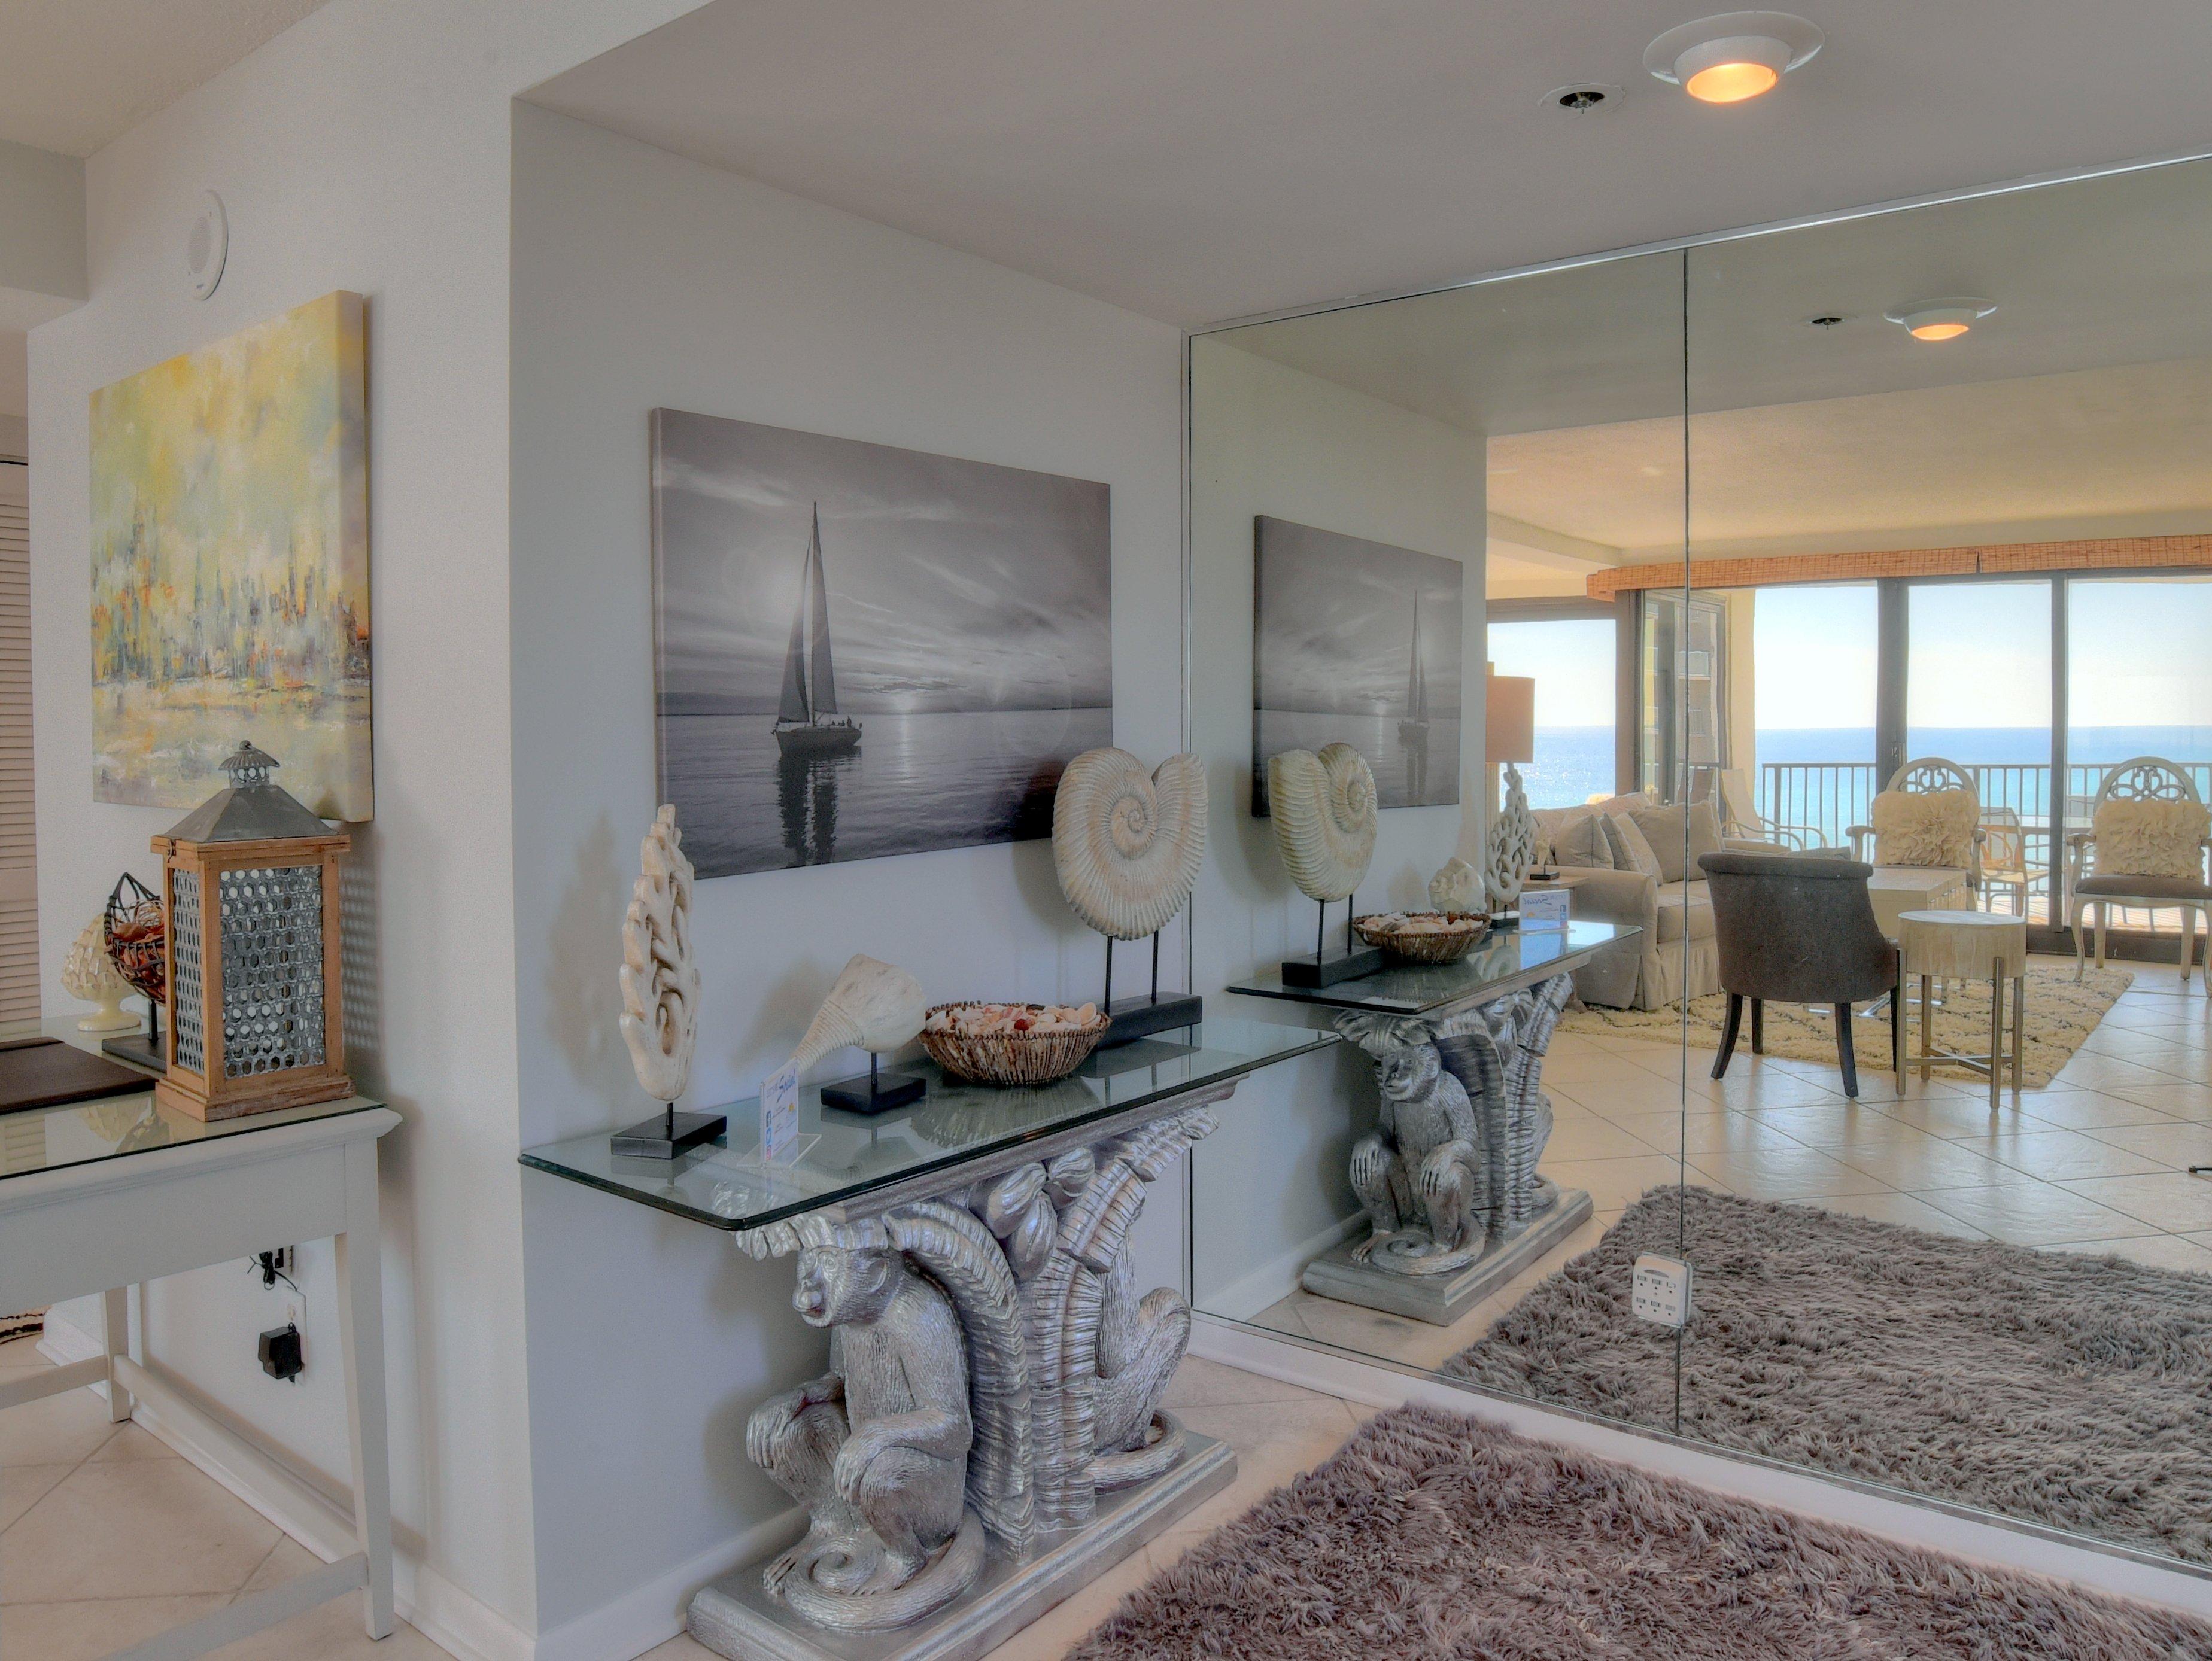 4096 Beachside One Condo rental in Beachside Towers at Sandestin in Destin Florida - #8